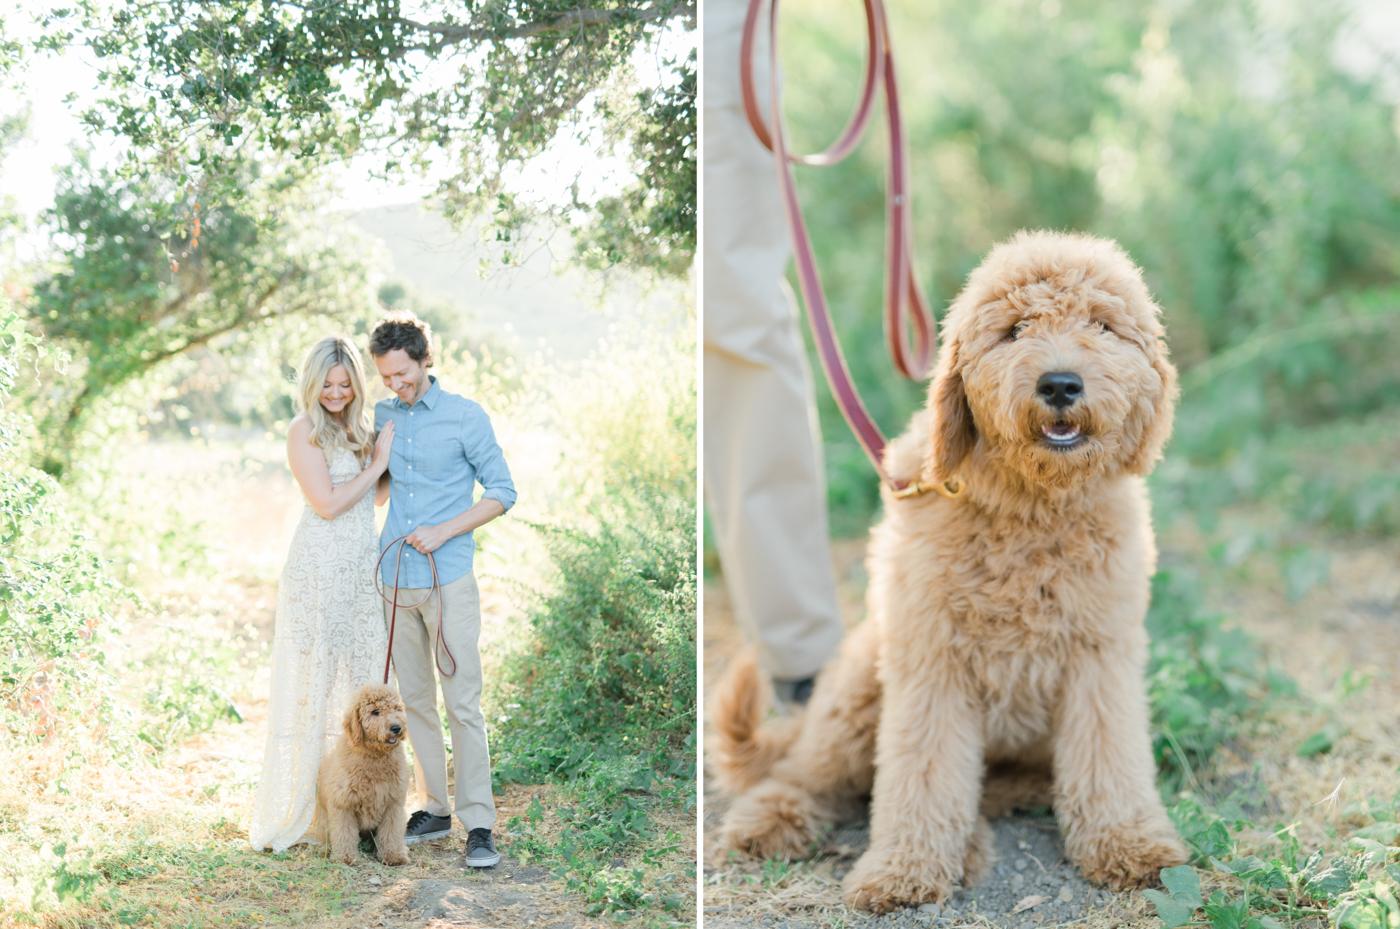 San_Juan_Capistrano_Goldendoodle_family_portrait_session_los_angeles_wedding_photographer-10.jpg